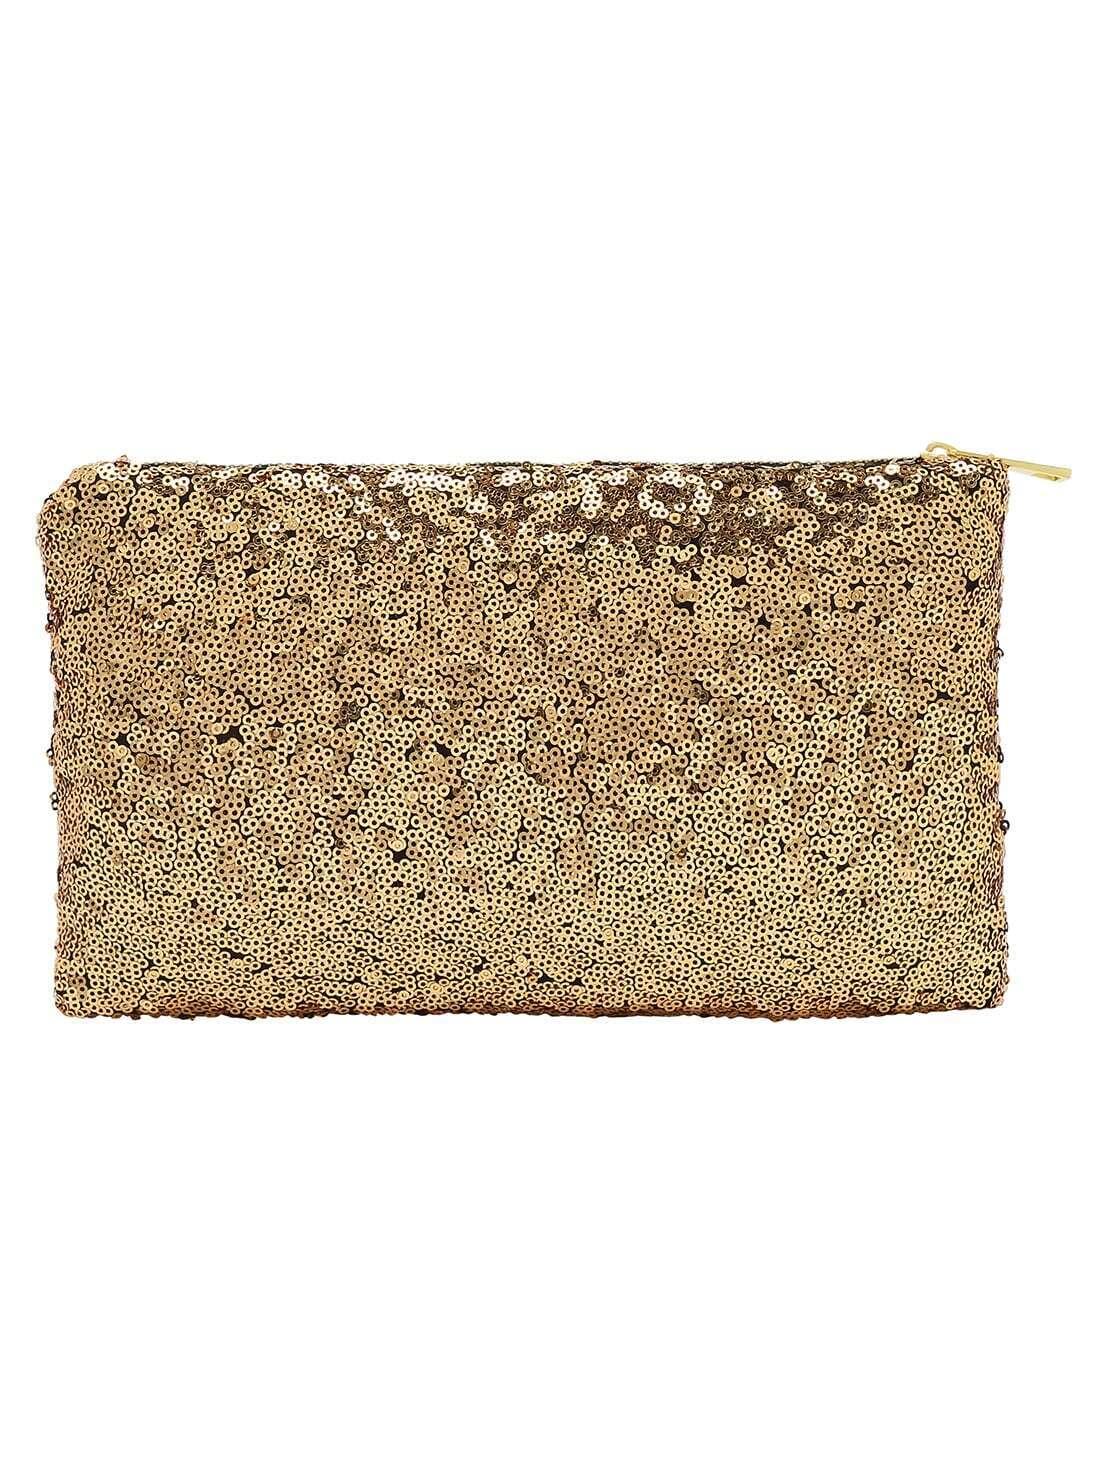 Gold Zipper Sequined Clutch Bag